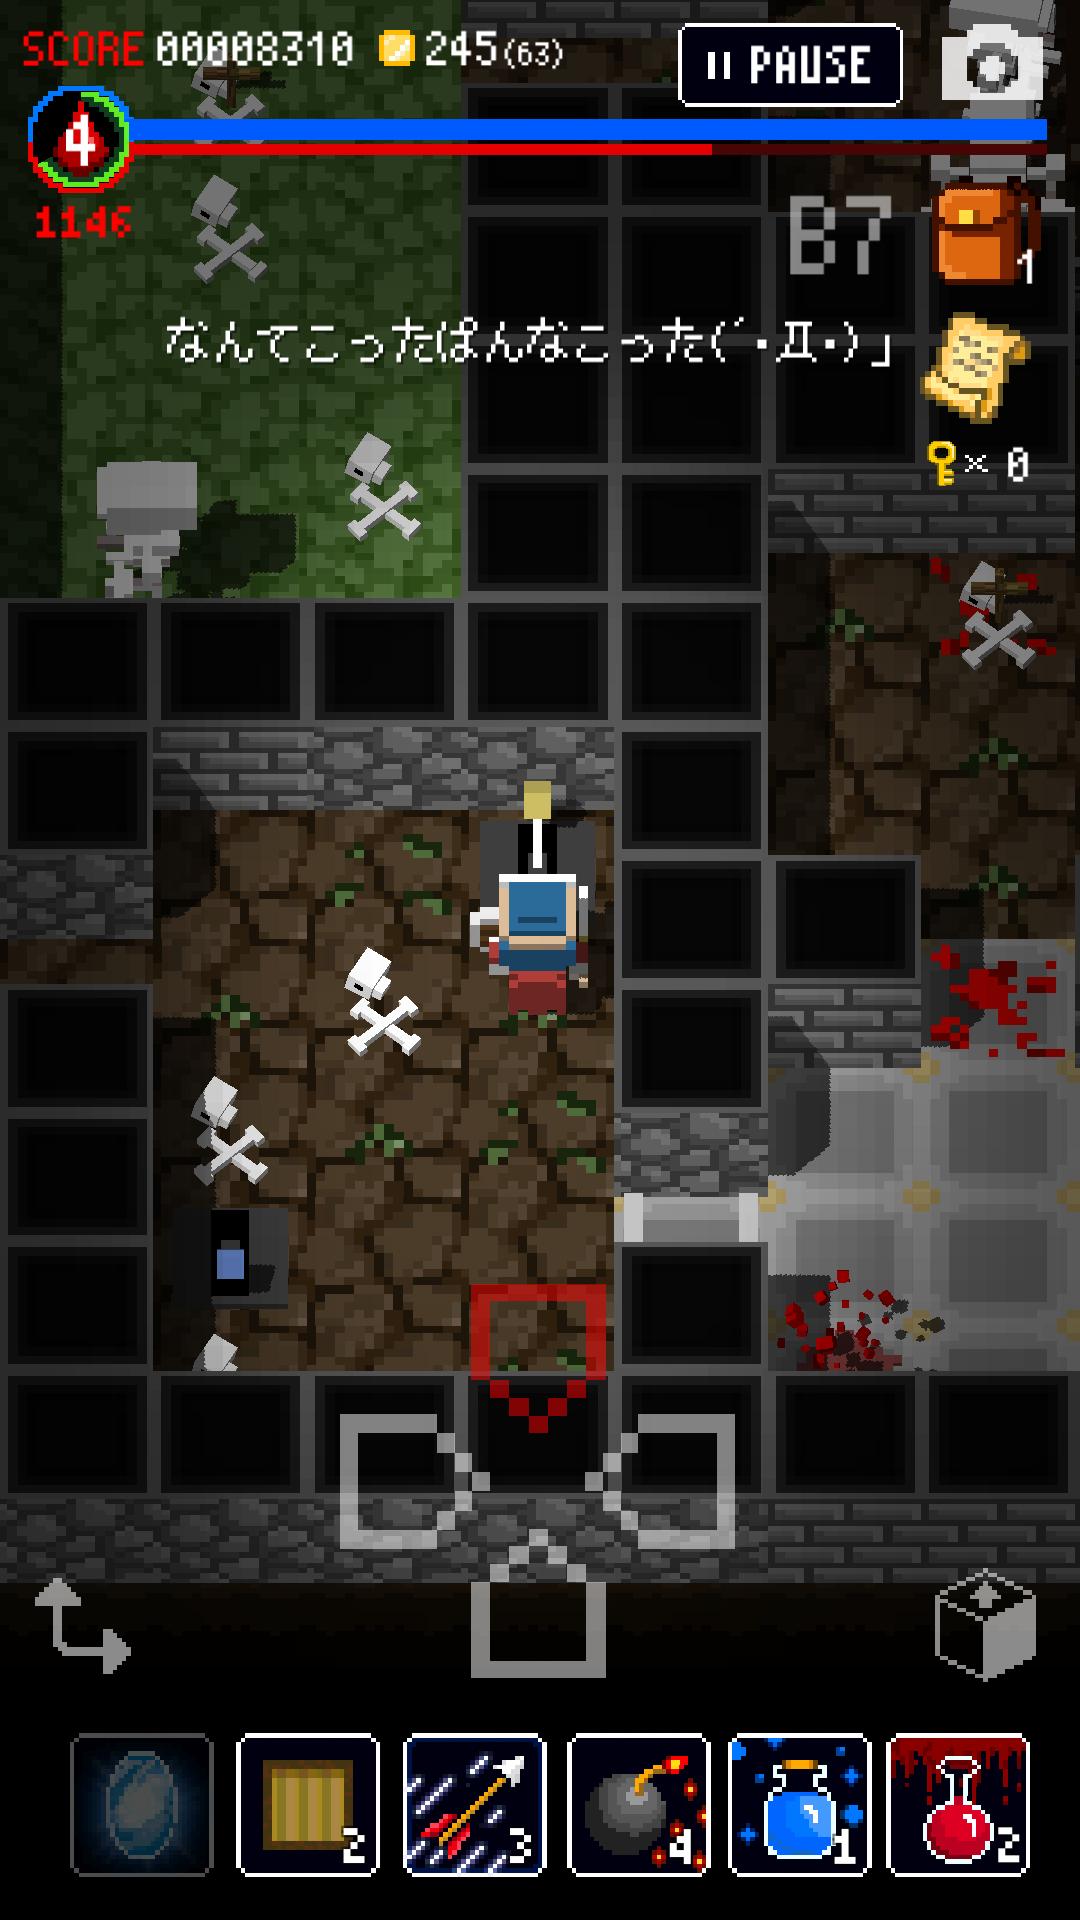 androidアプリ ダンジョンに立つ墓標(Dungeon of Gravestone)攻略スクリーンショット6